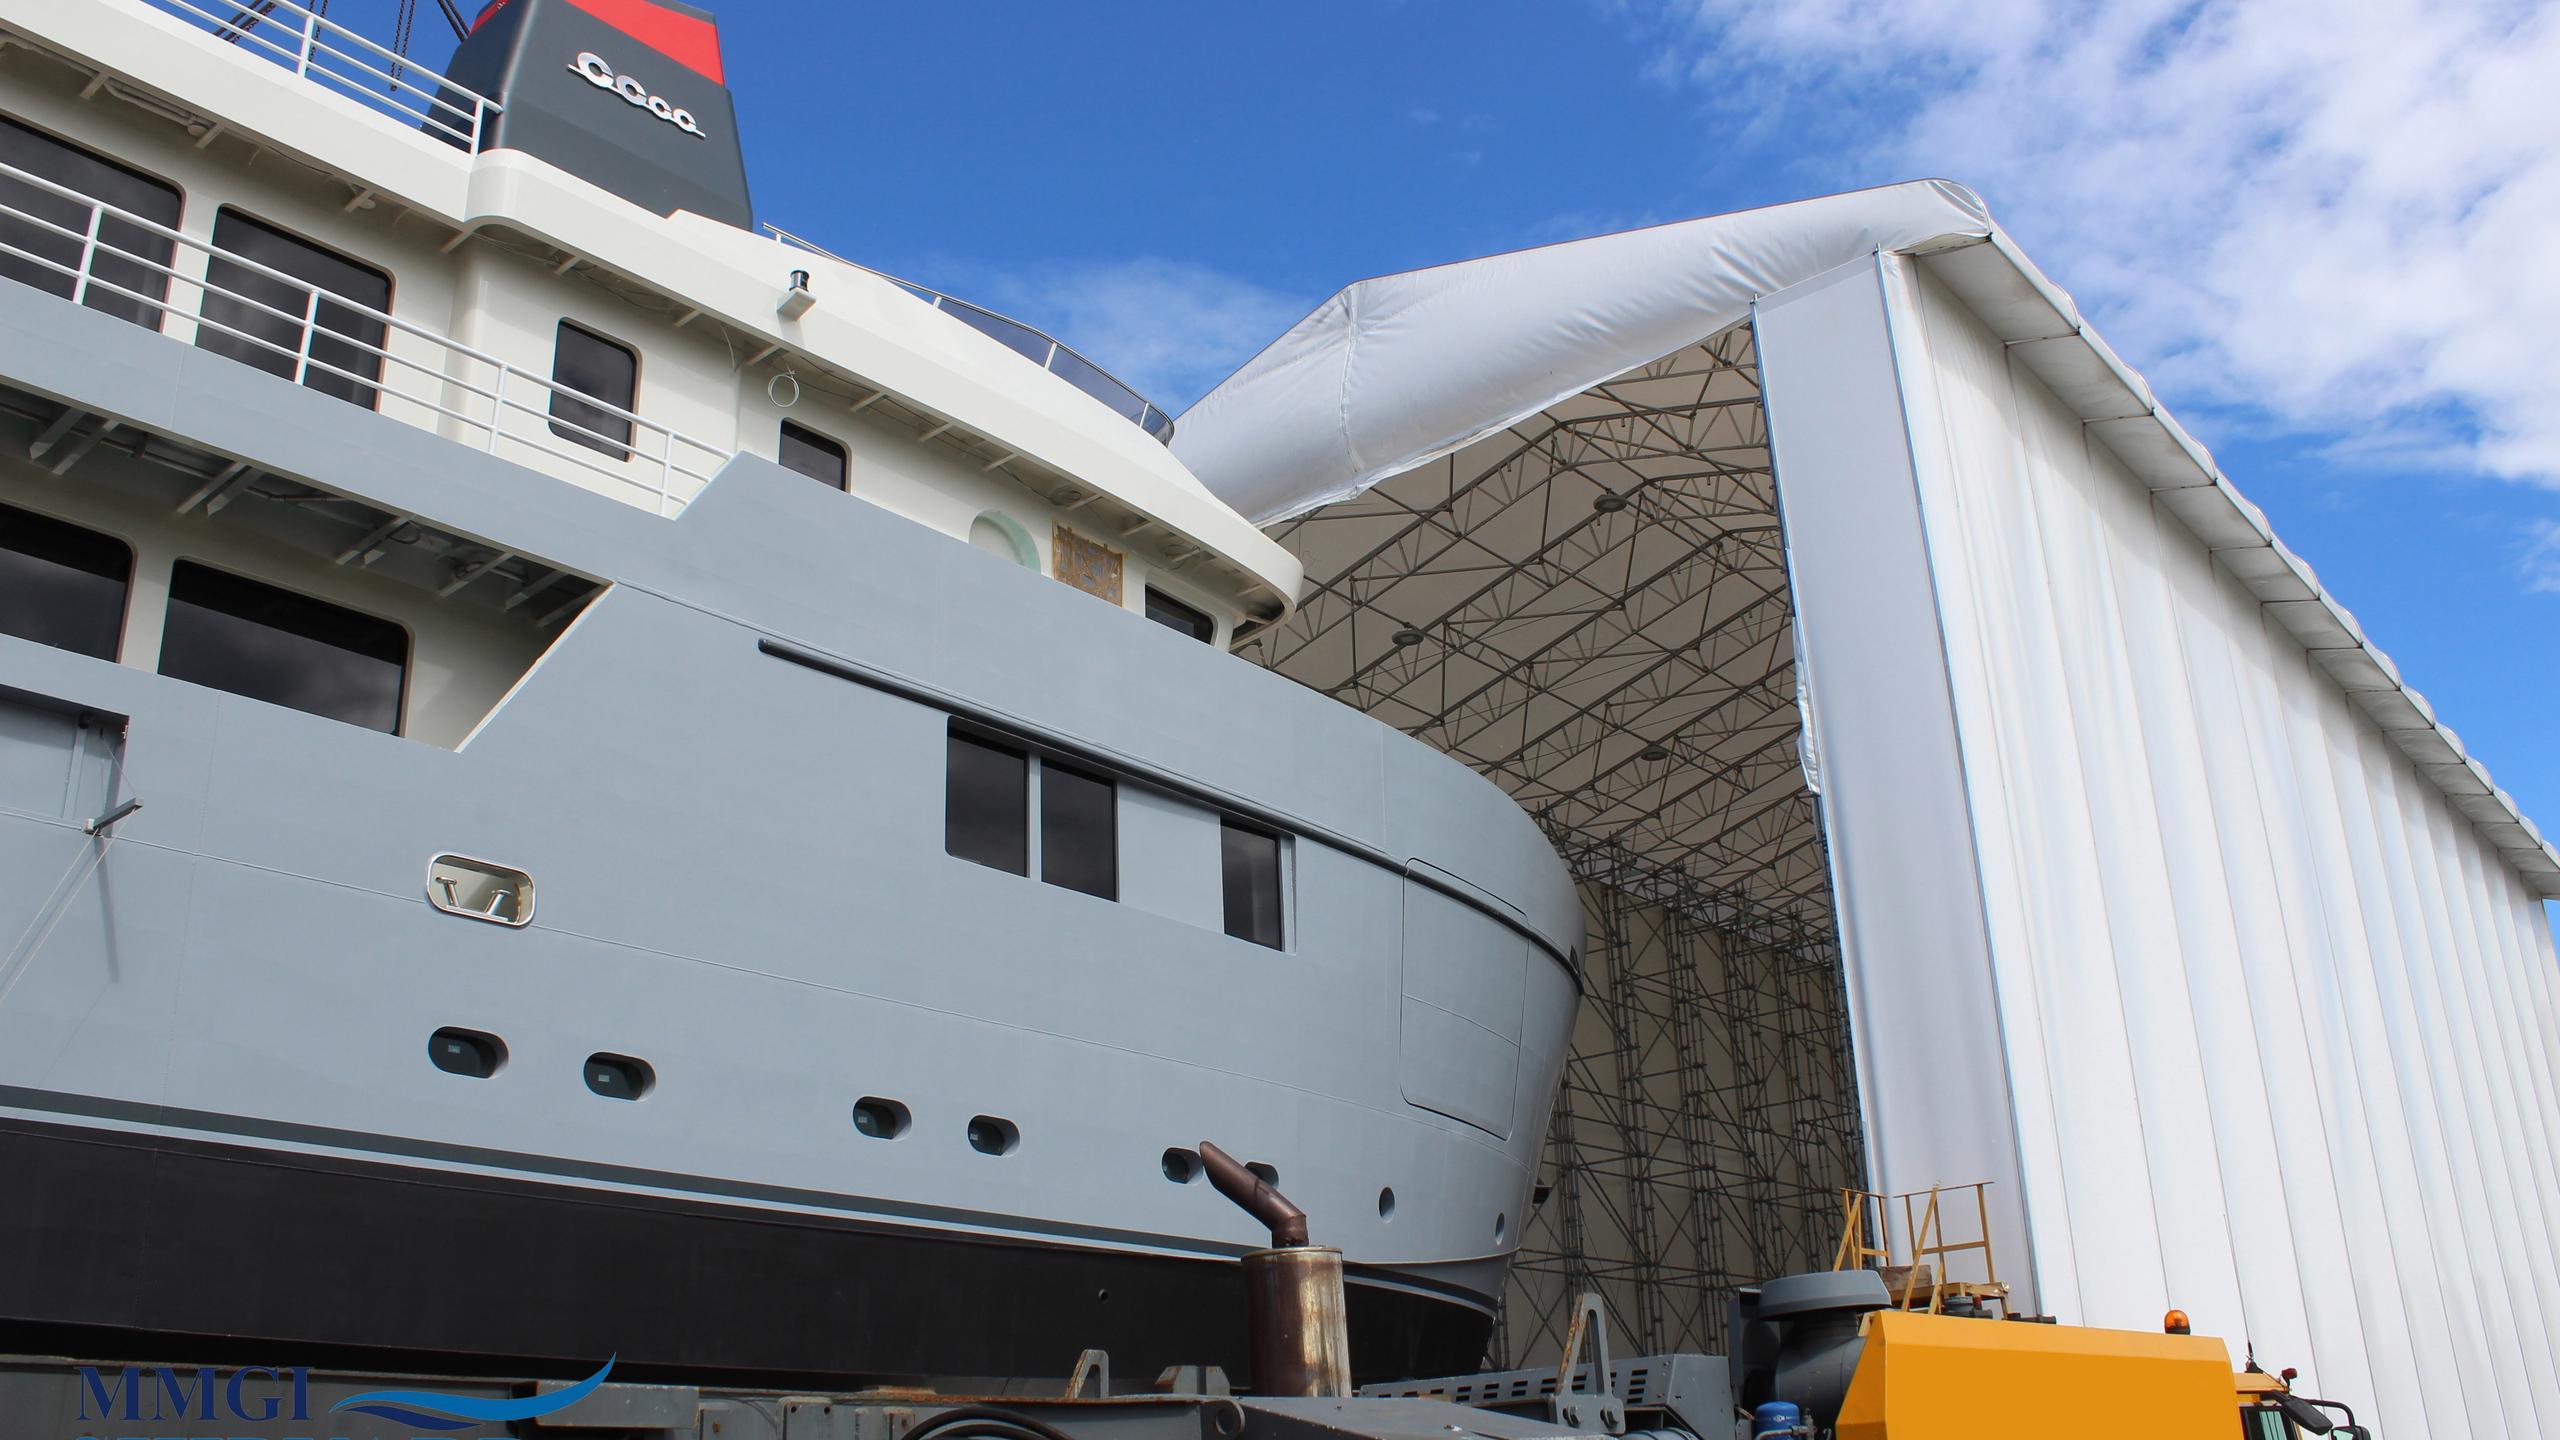 CAROLIN-IV-motor-yacht-mmgi-omega-forte-100-101m-2016-shipyard